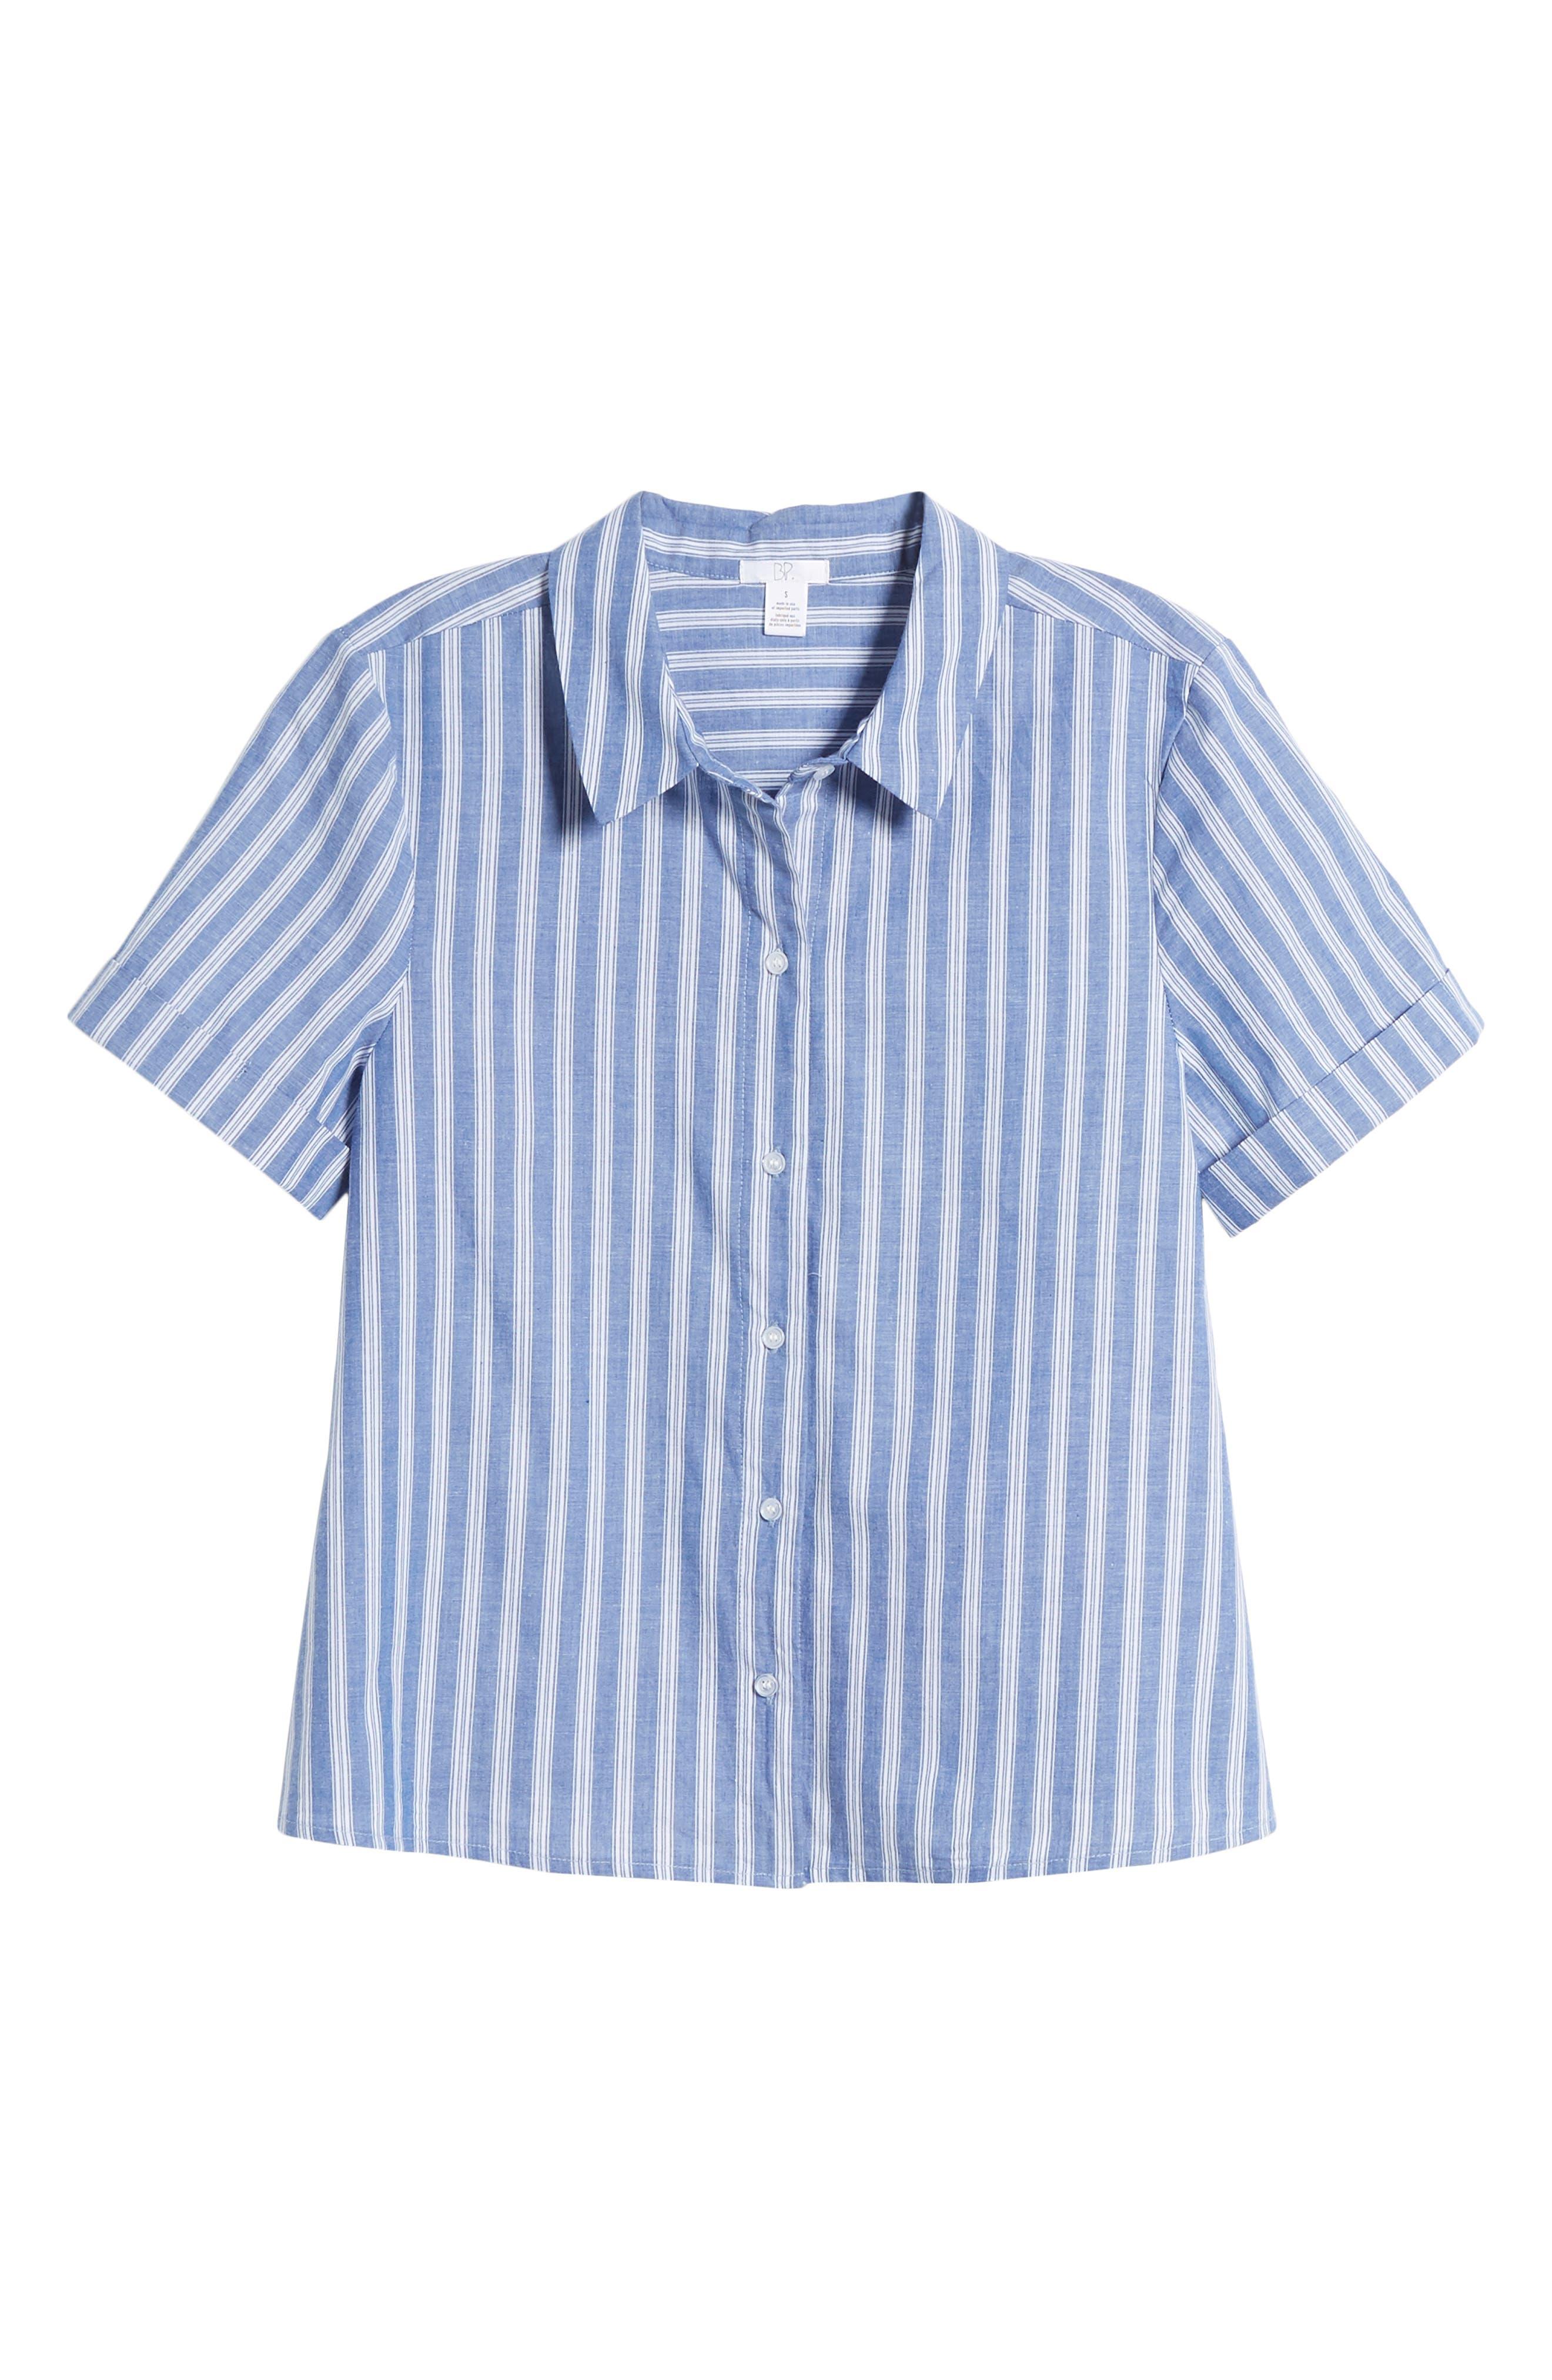 Stripe Tie Hem Top,                             Alternate thumbnail 7, color,                             Blue Celestial Stripe